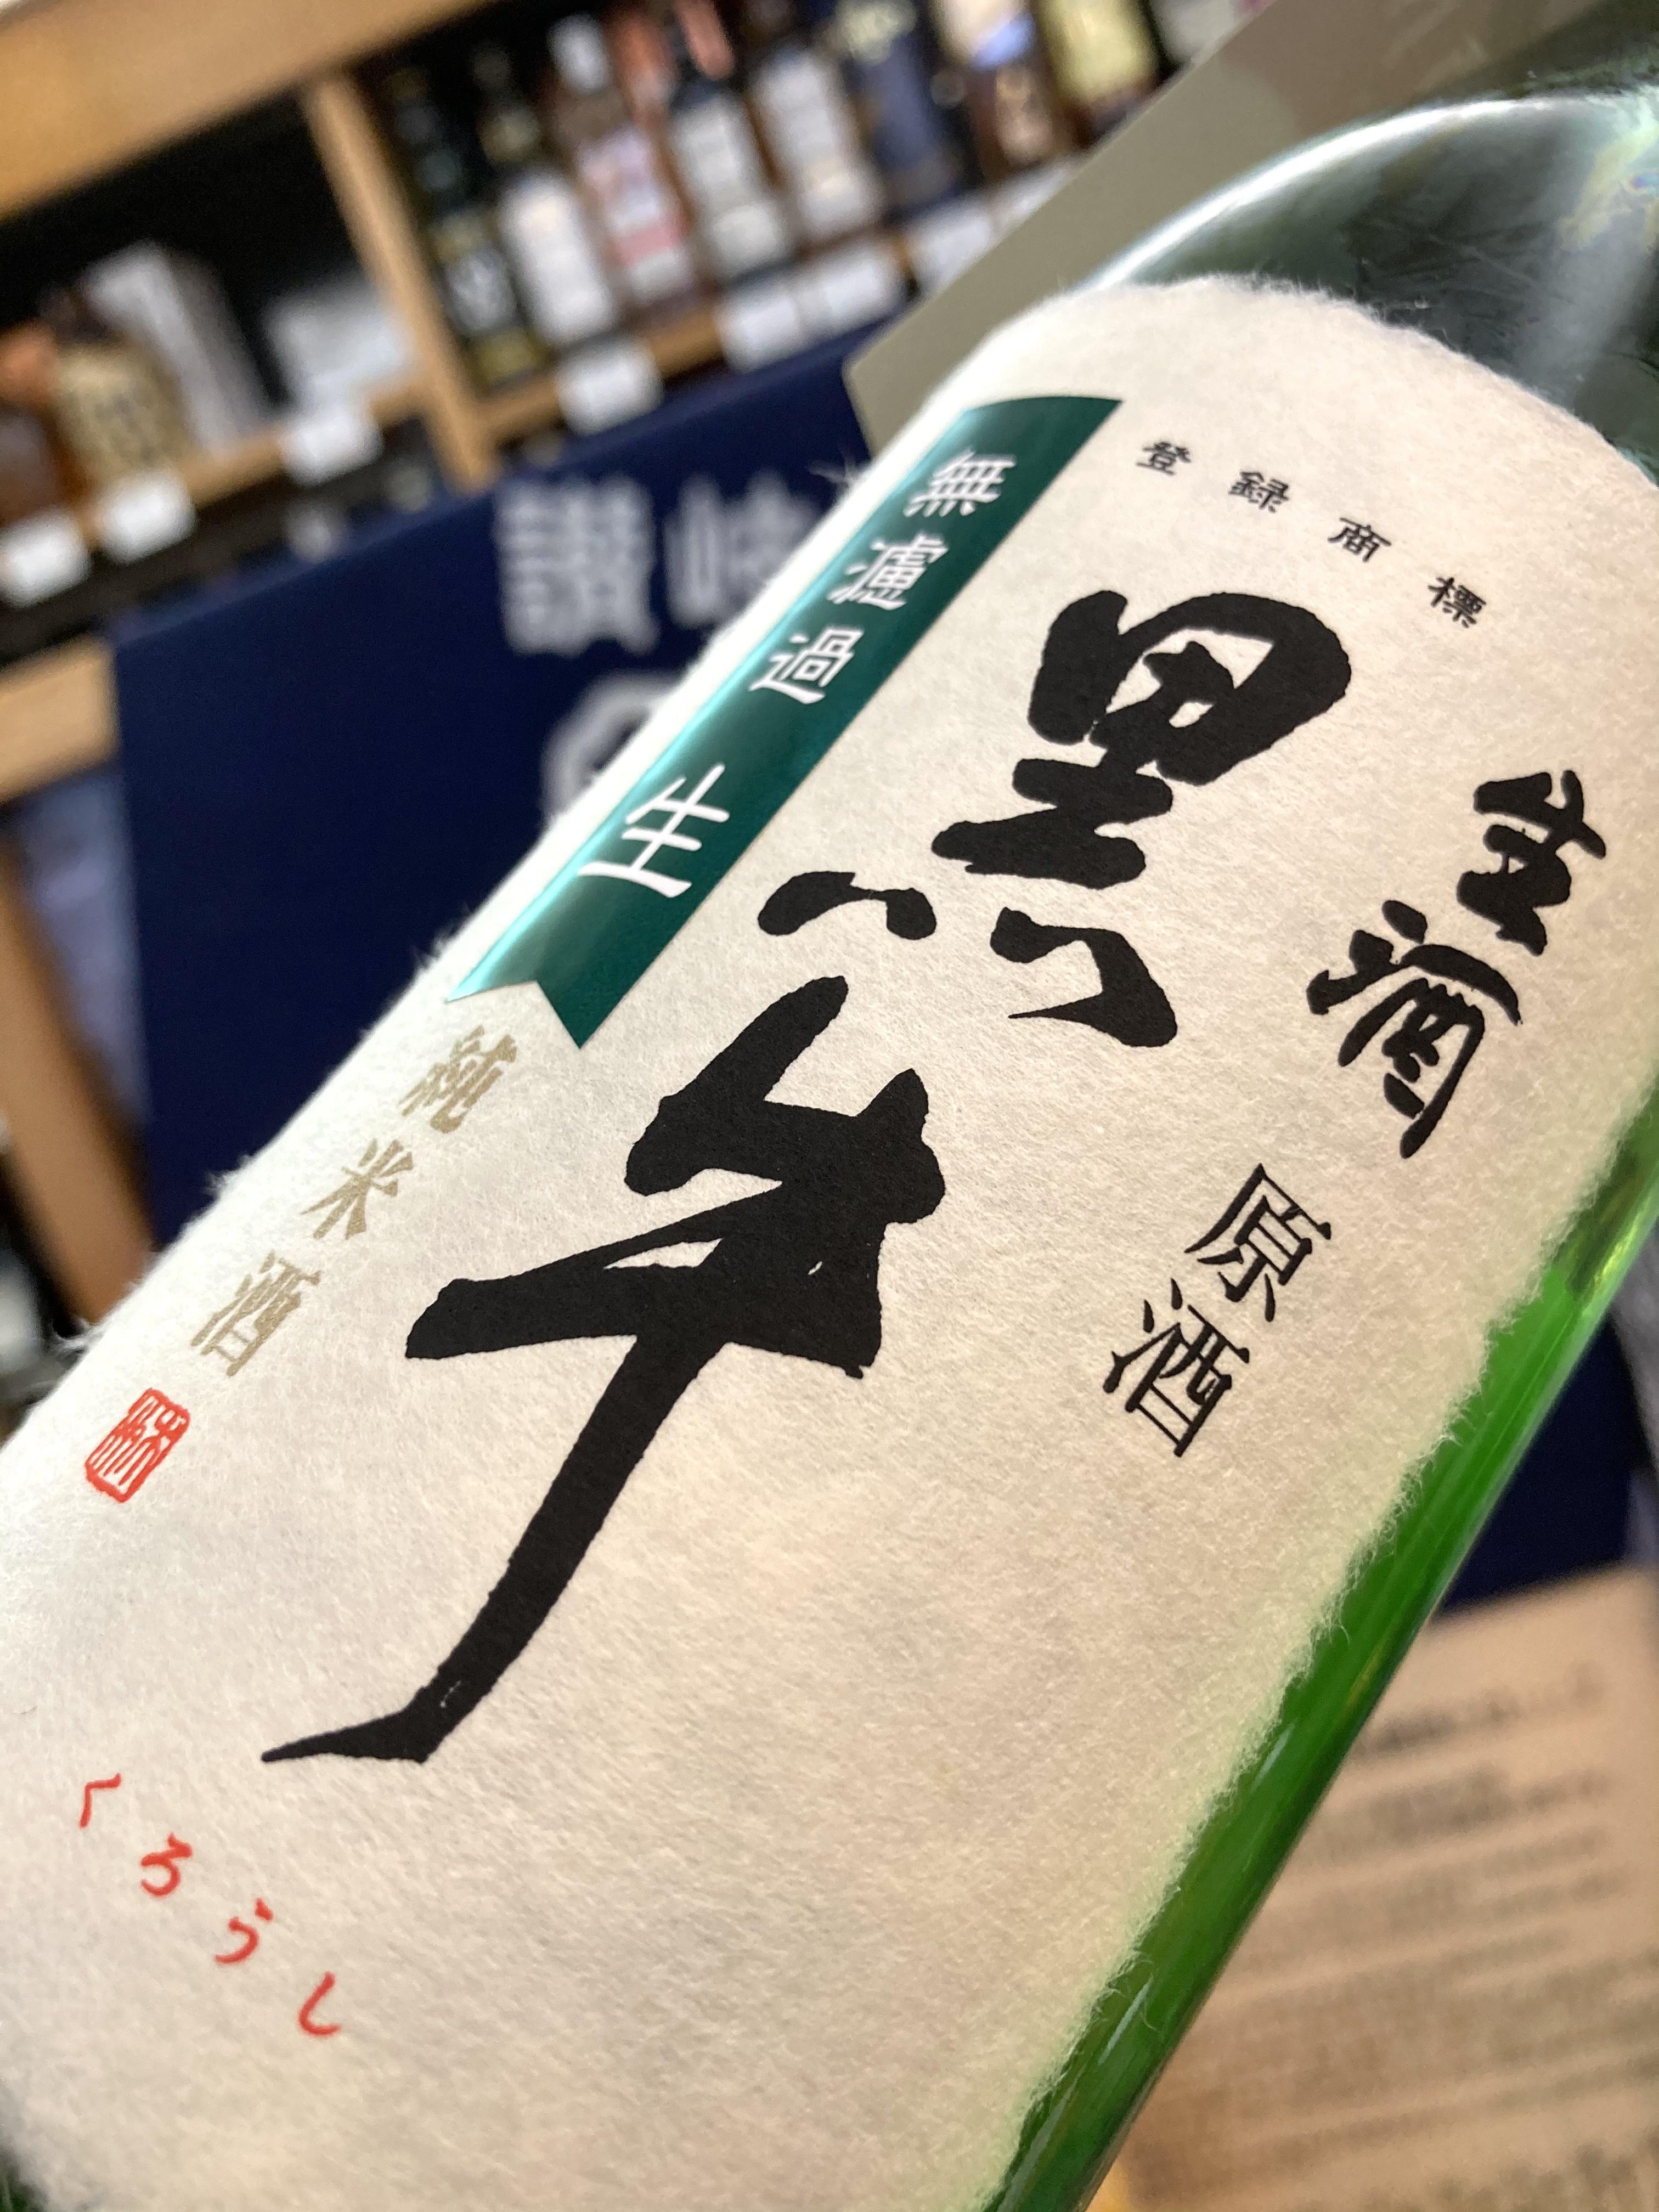 小豆島出身杜氏が醸す「黒牛」定番酒の生原酒☆ 『黒牛 純米酒 無濾過生原酒』